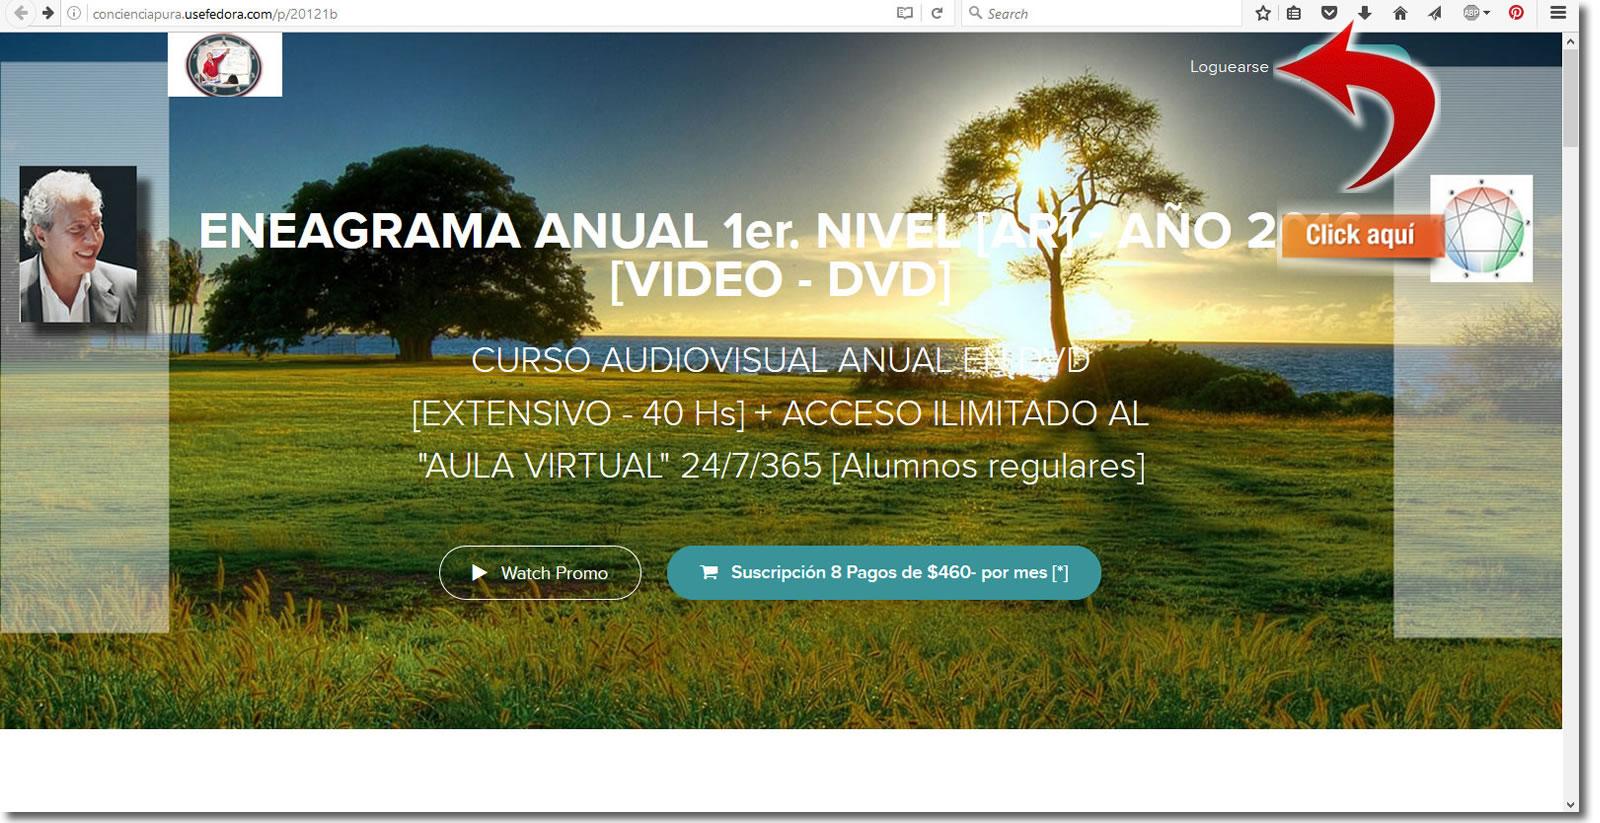 enea1-2016-acceso-paso1-1-fullscreen-capture-11232016-101013-am